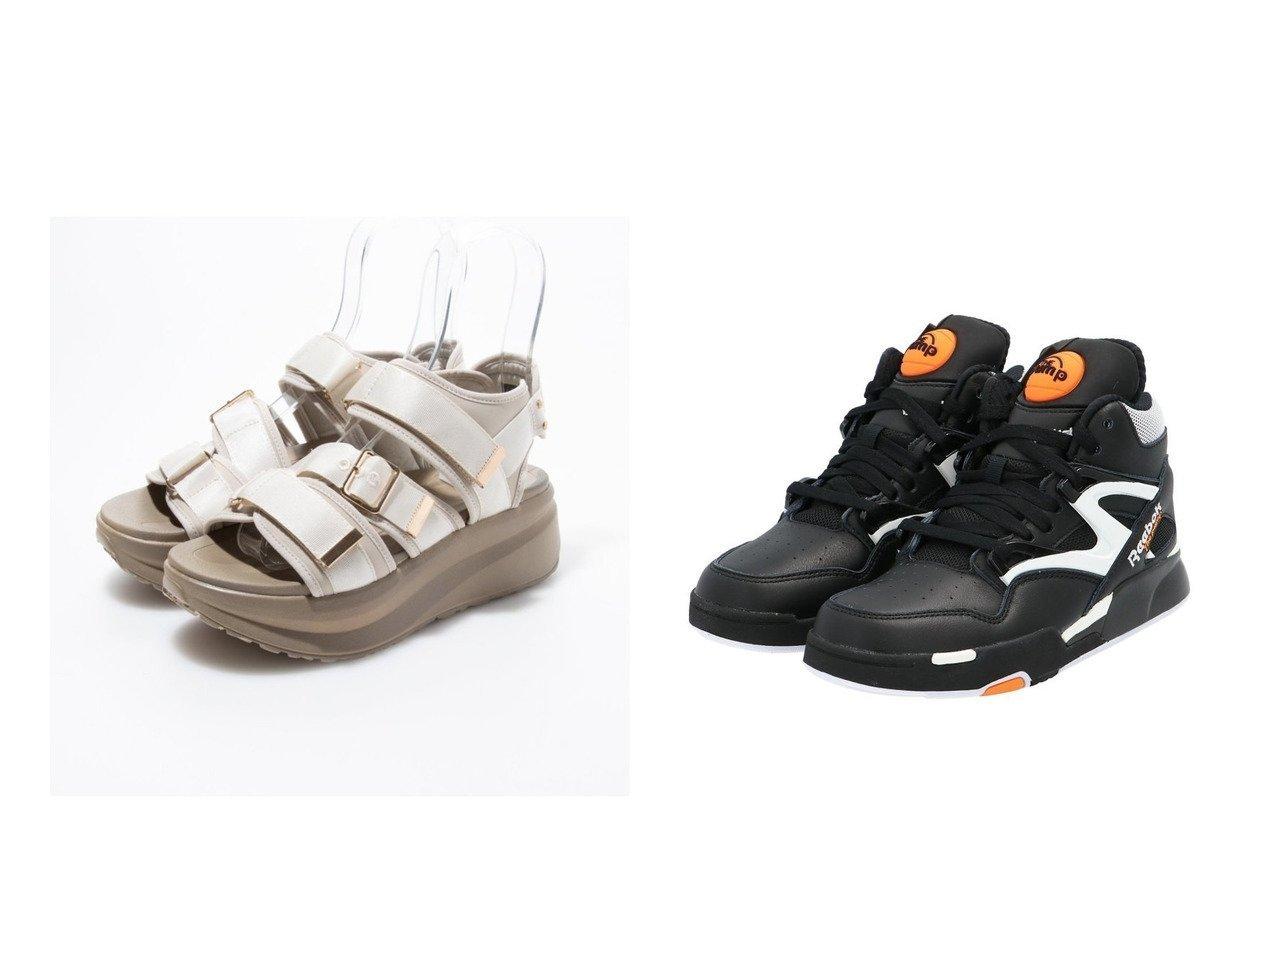 【EVOL/イーボル】のベルトサンダル&【Reebok CLASSIC/リーボック】のポンプ オムニ ゾーン II Pump Omni Zone II Shoes リーボック 【シューズ・靴】おすすめ!人気、トレンド・レディースファッションの通販   | レディースファッション・服の通販 founy(ファニー)